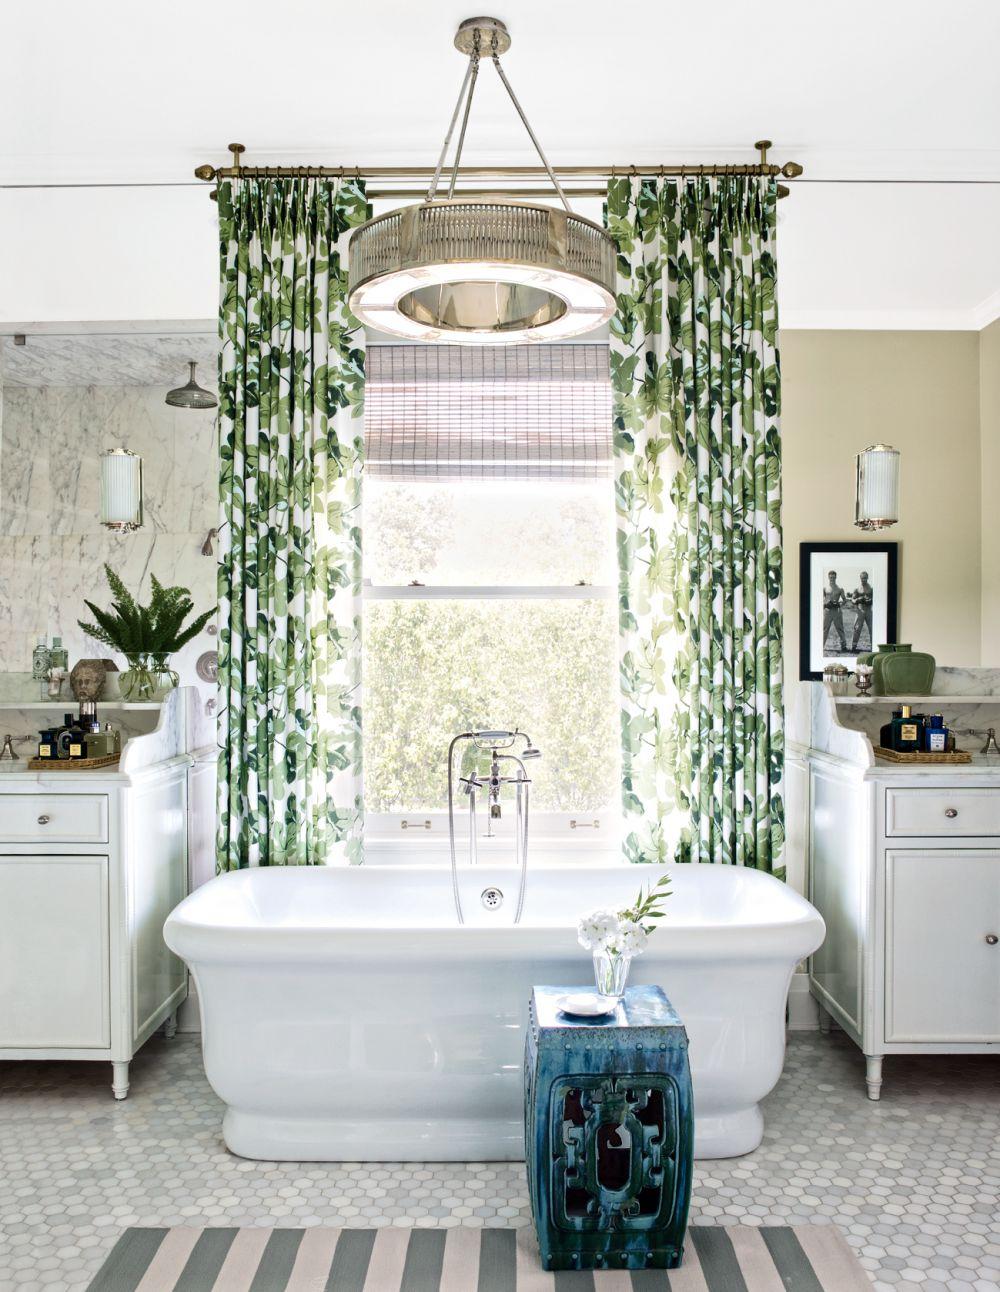 banana leaf curtains garden stool honey comb tiles better decorating bible blog spa like bathroom how to